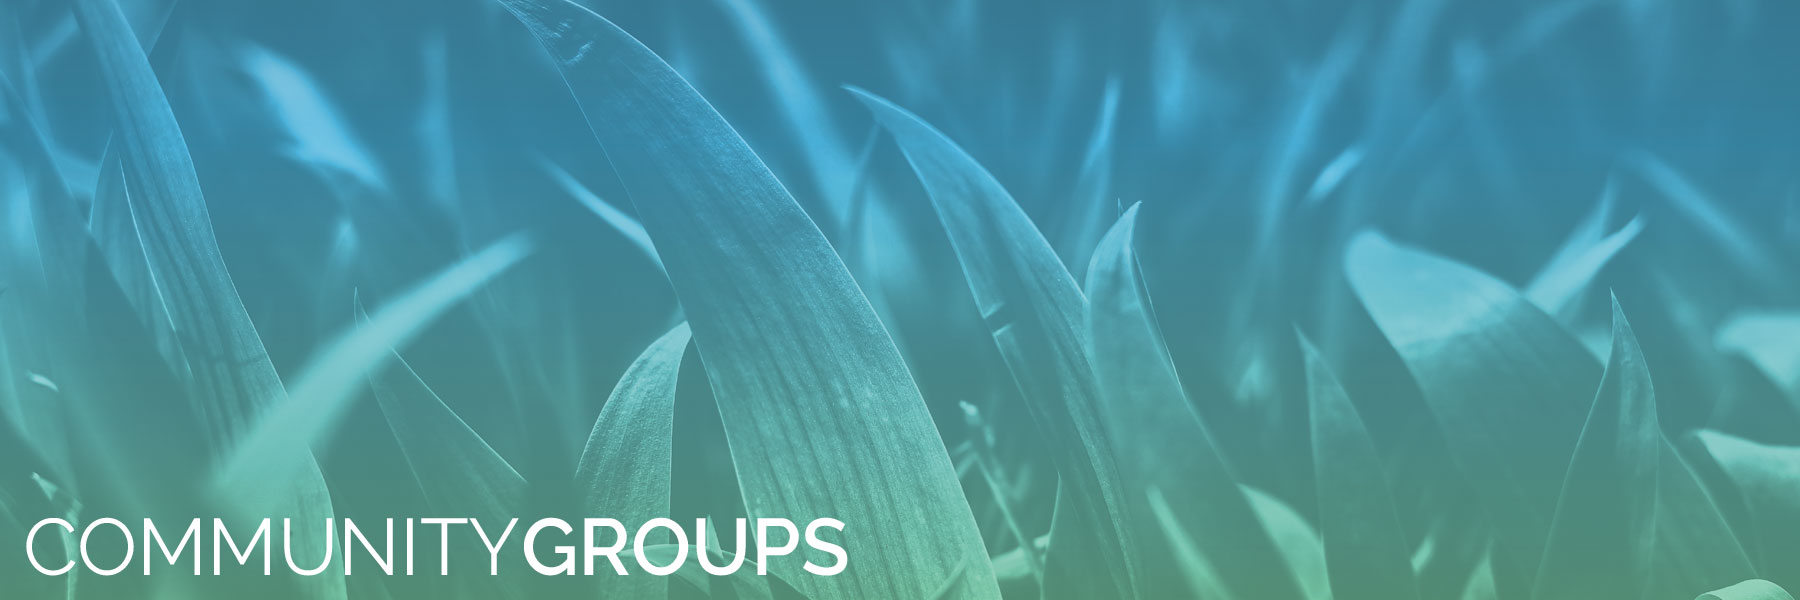 Community-Groups-1800x600